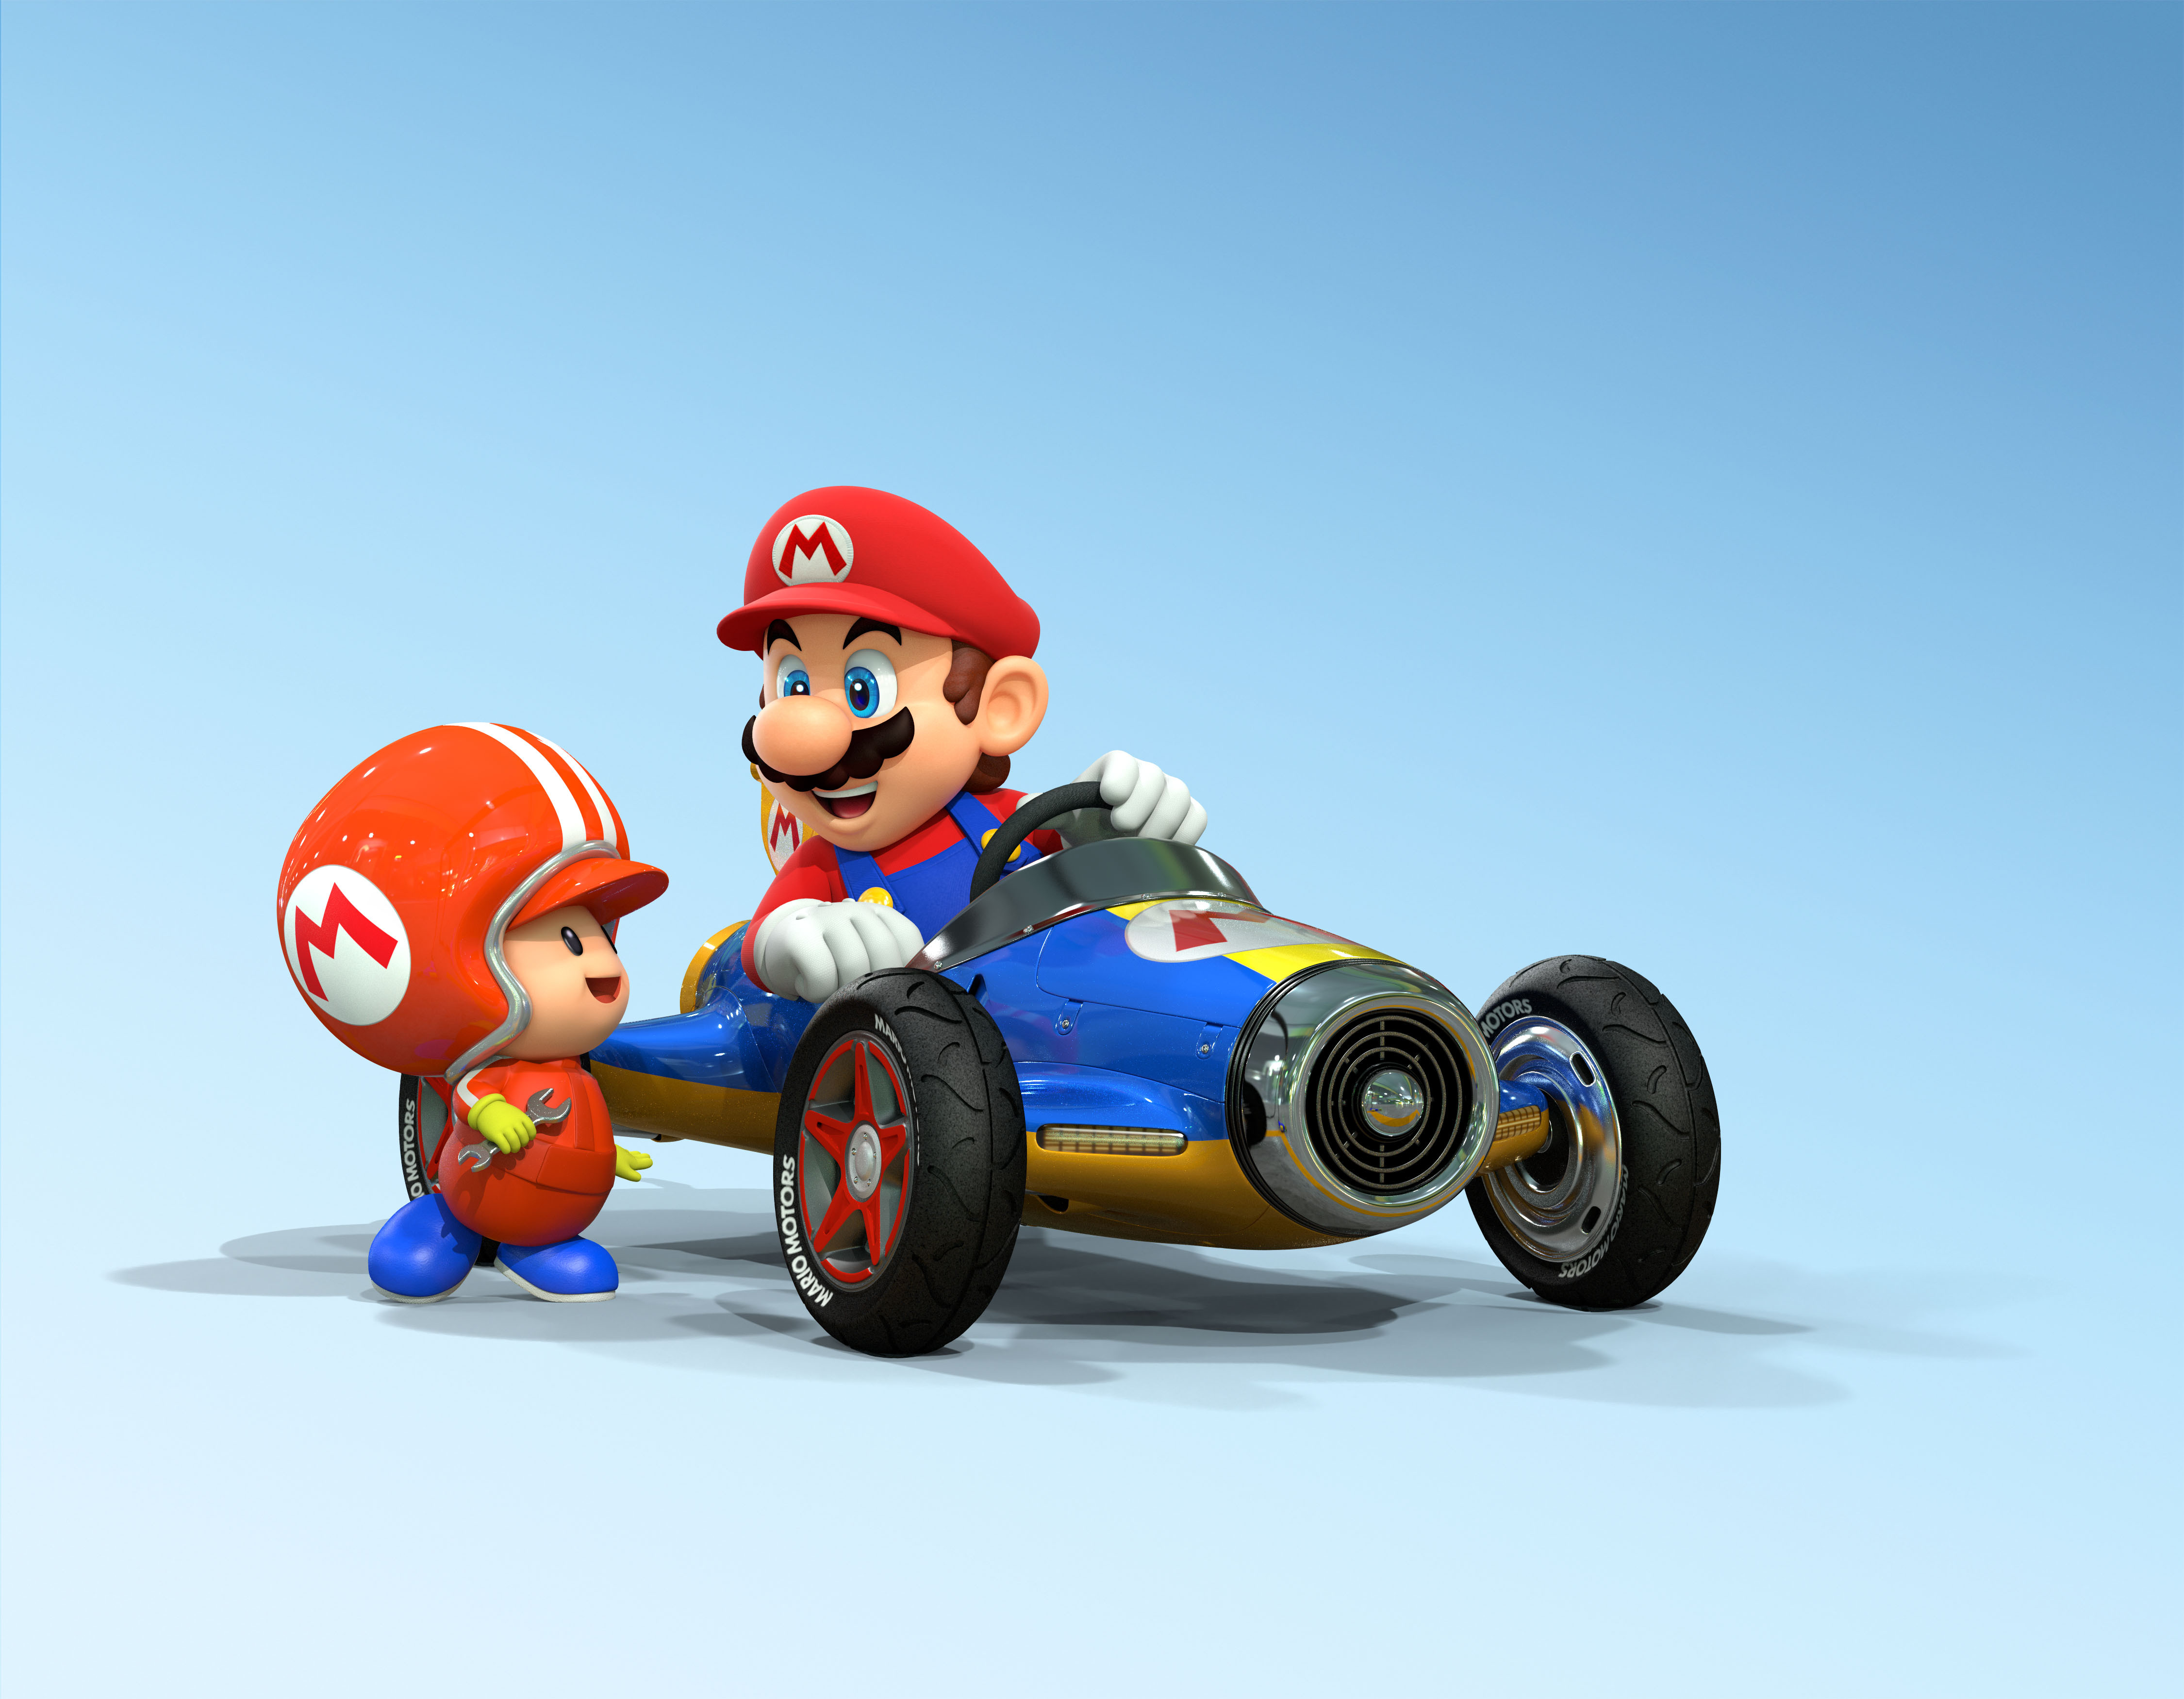 Mario Kart 8 Scores 89 On Metacritic | My Nintendo News